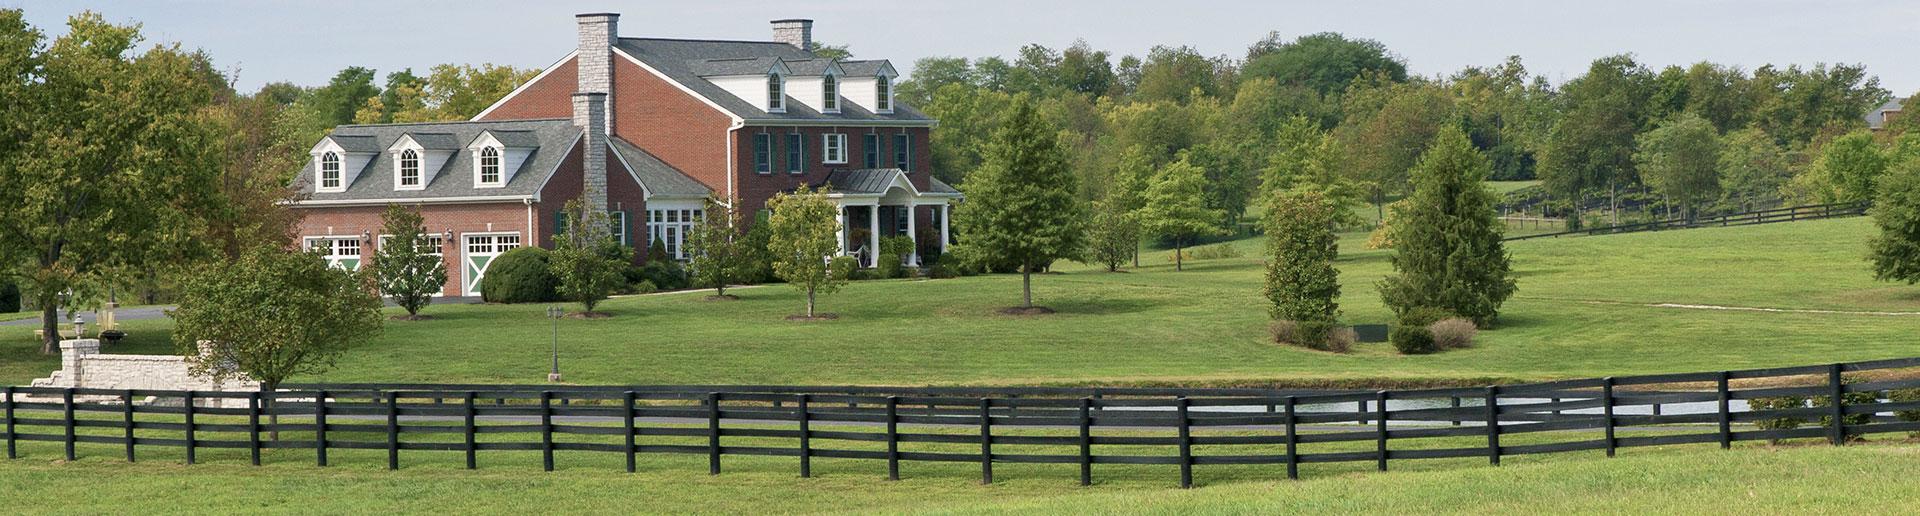 Tryon, Polk County, Rutherford County, North Carolina Horse